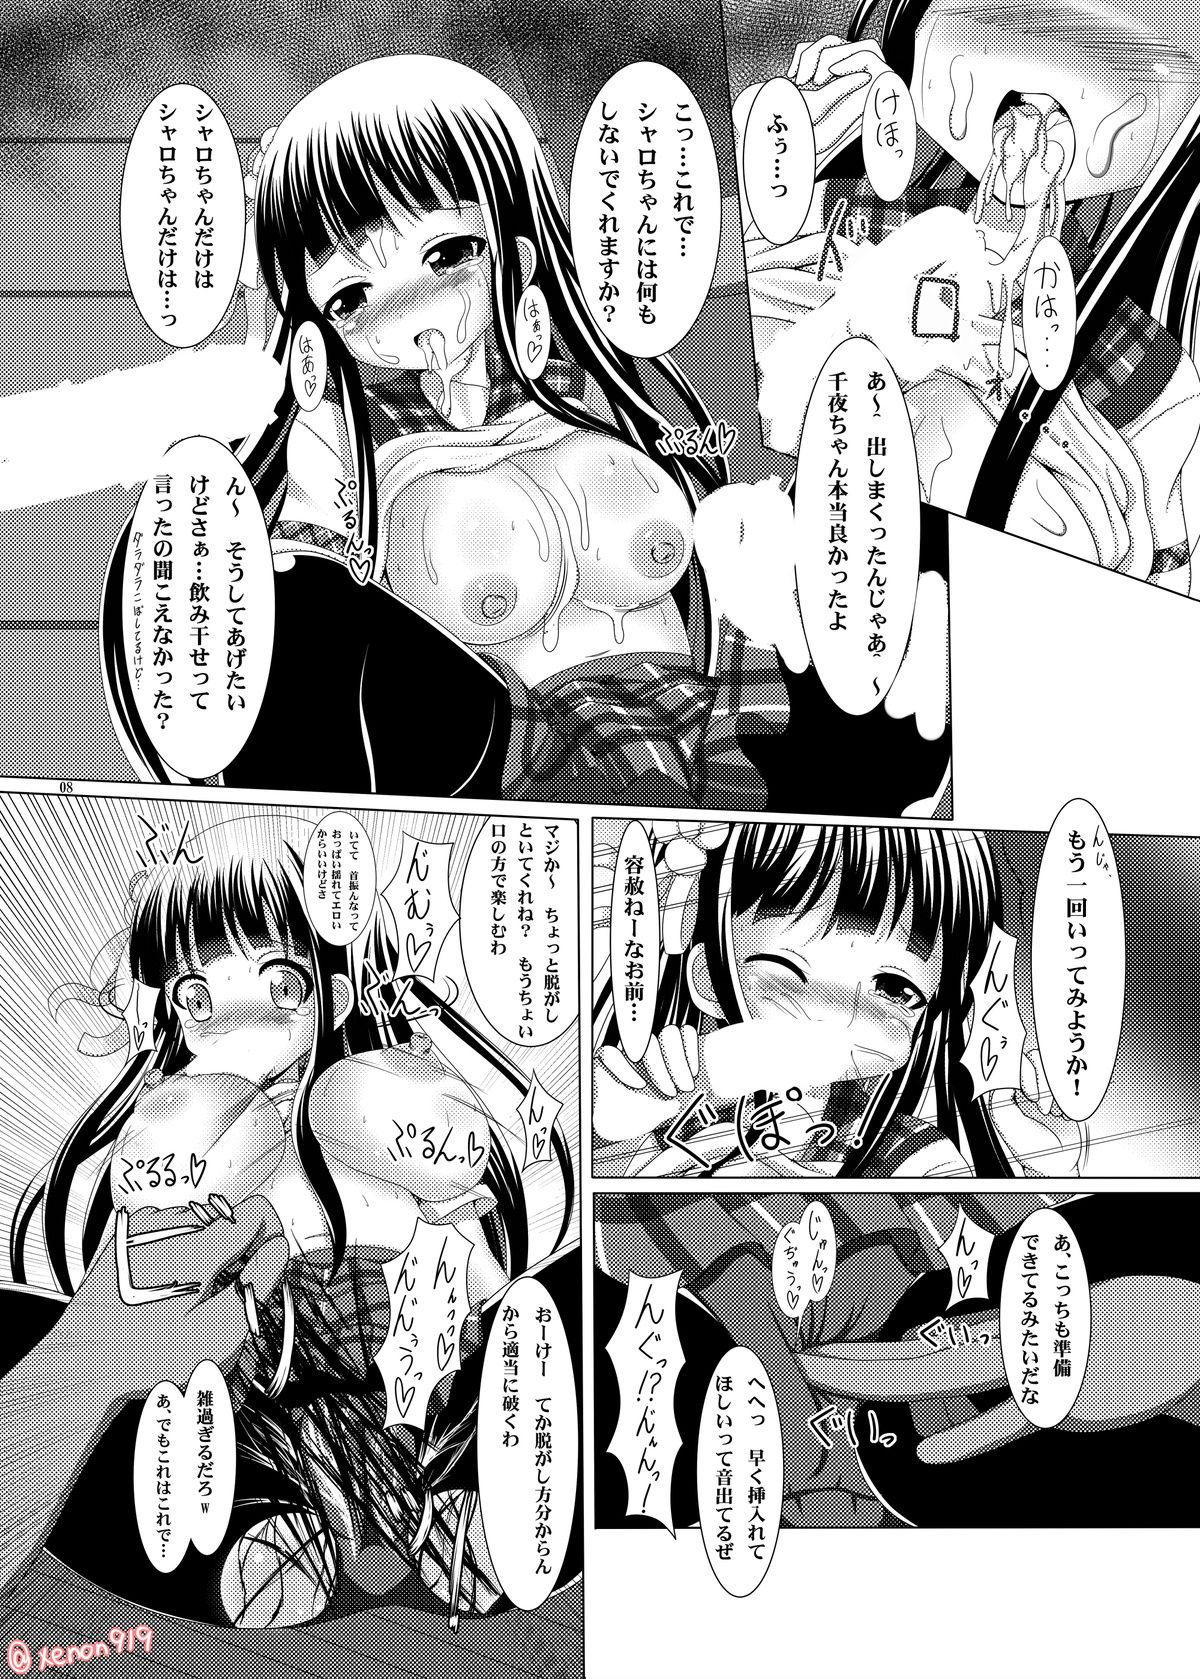 Kurokami Midareshi Chiya to Narite 6